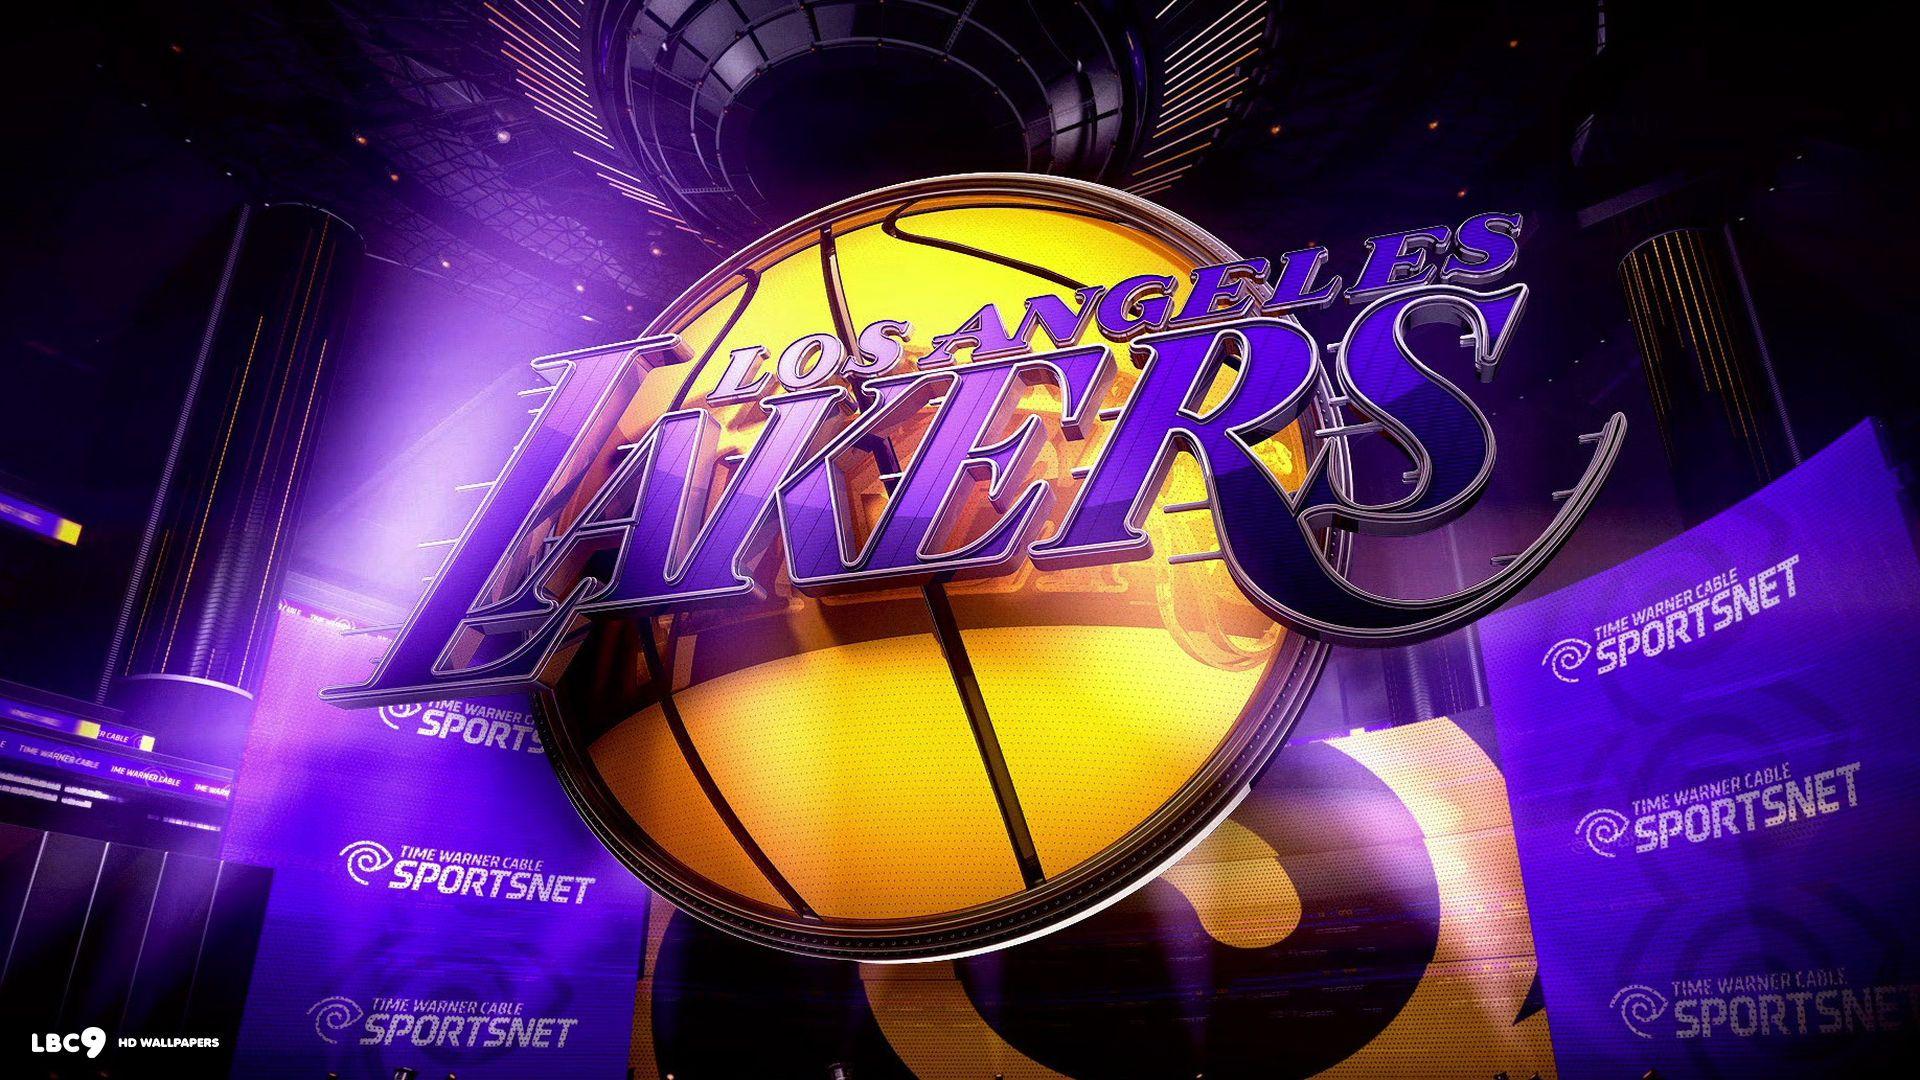 3d Lakers Wallpaper High Definition | Wallpaper | Lakers wallpaper, Los angeles lakers logo, La ...